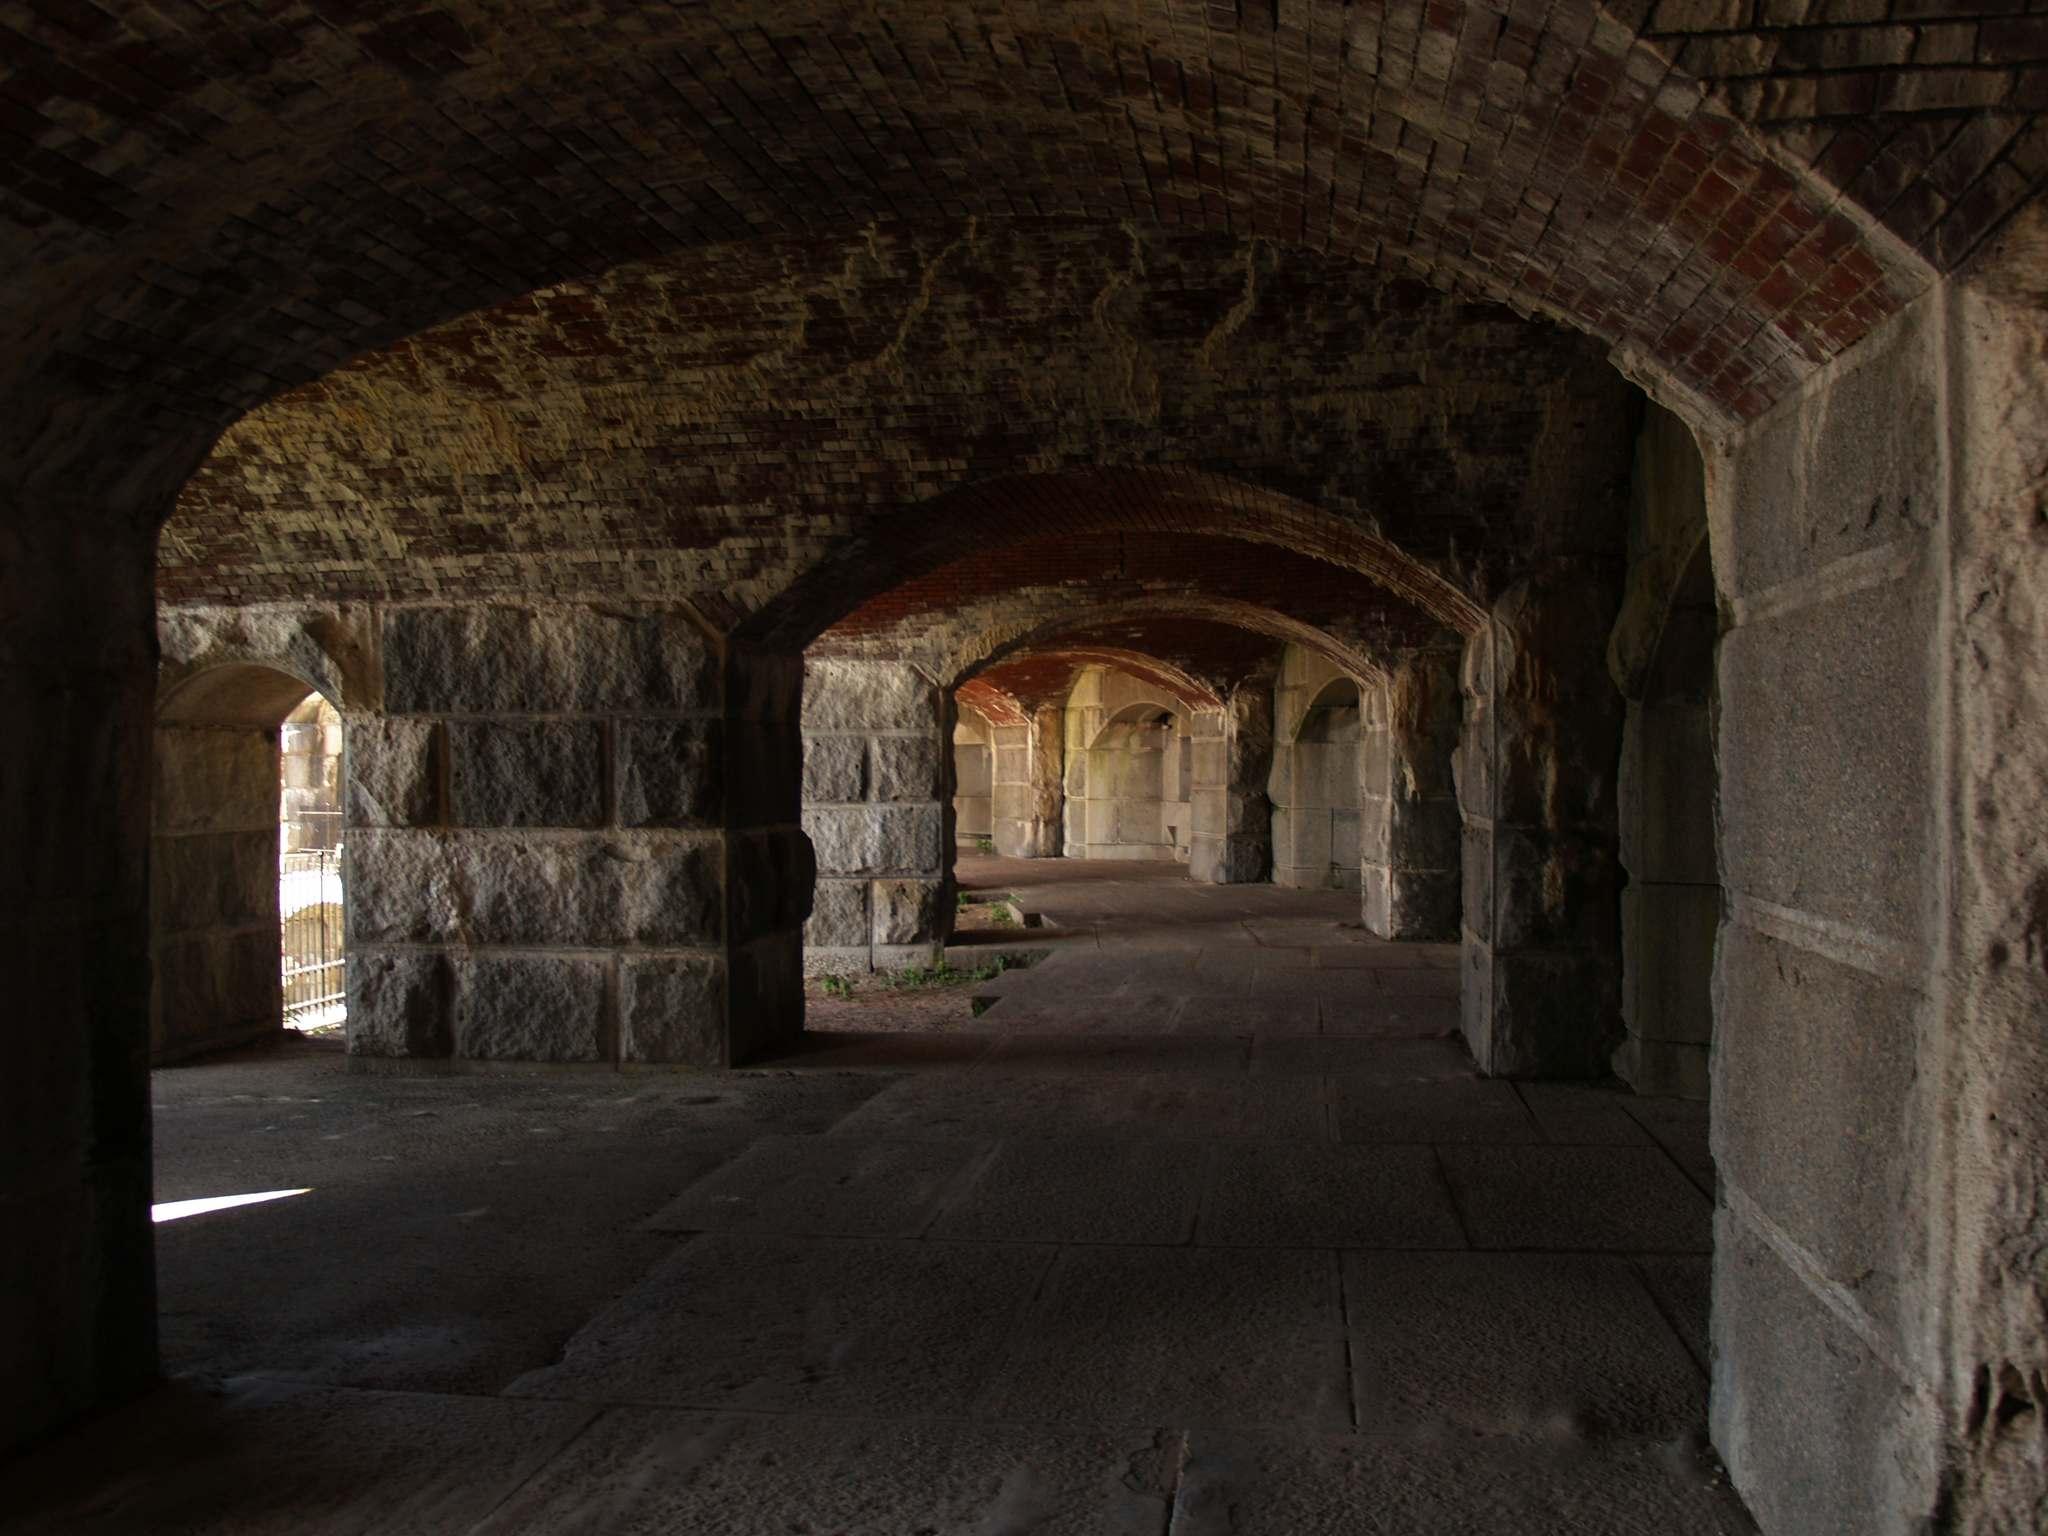 fort popham4 Majestic Fort Popham, Maine